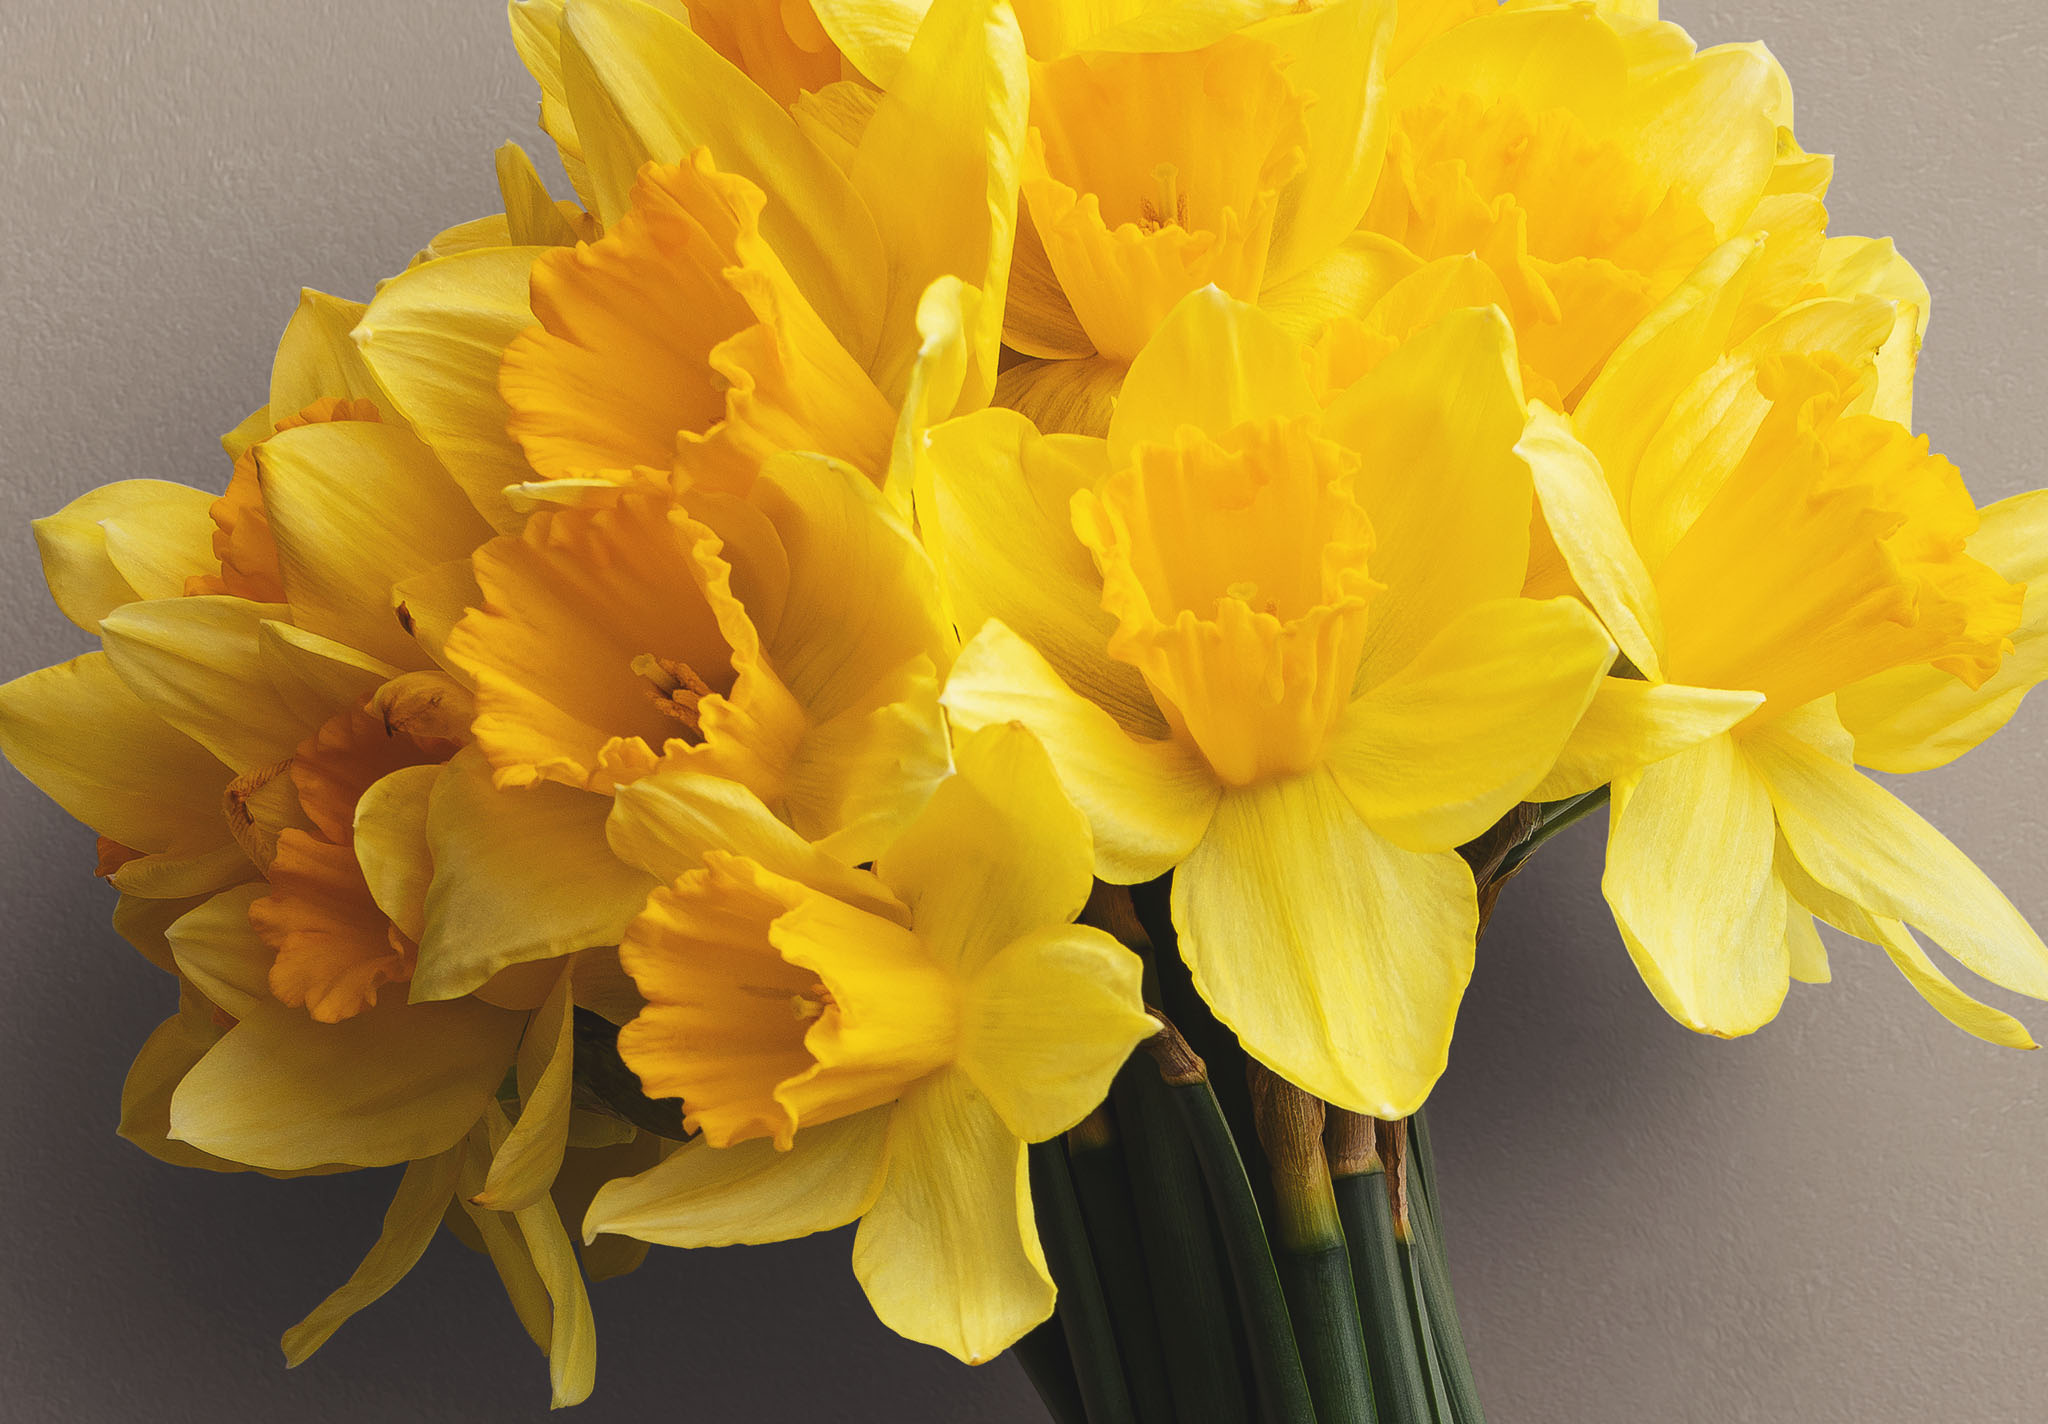 Daffodils Custom Scene Creator Template 3 Image04